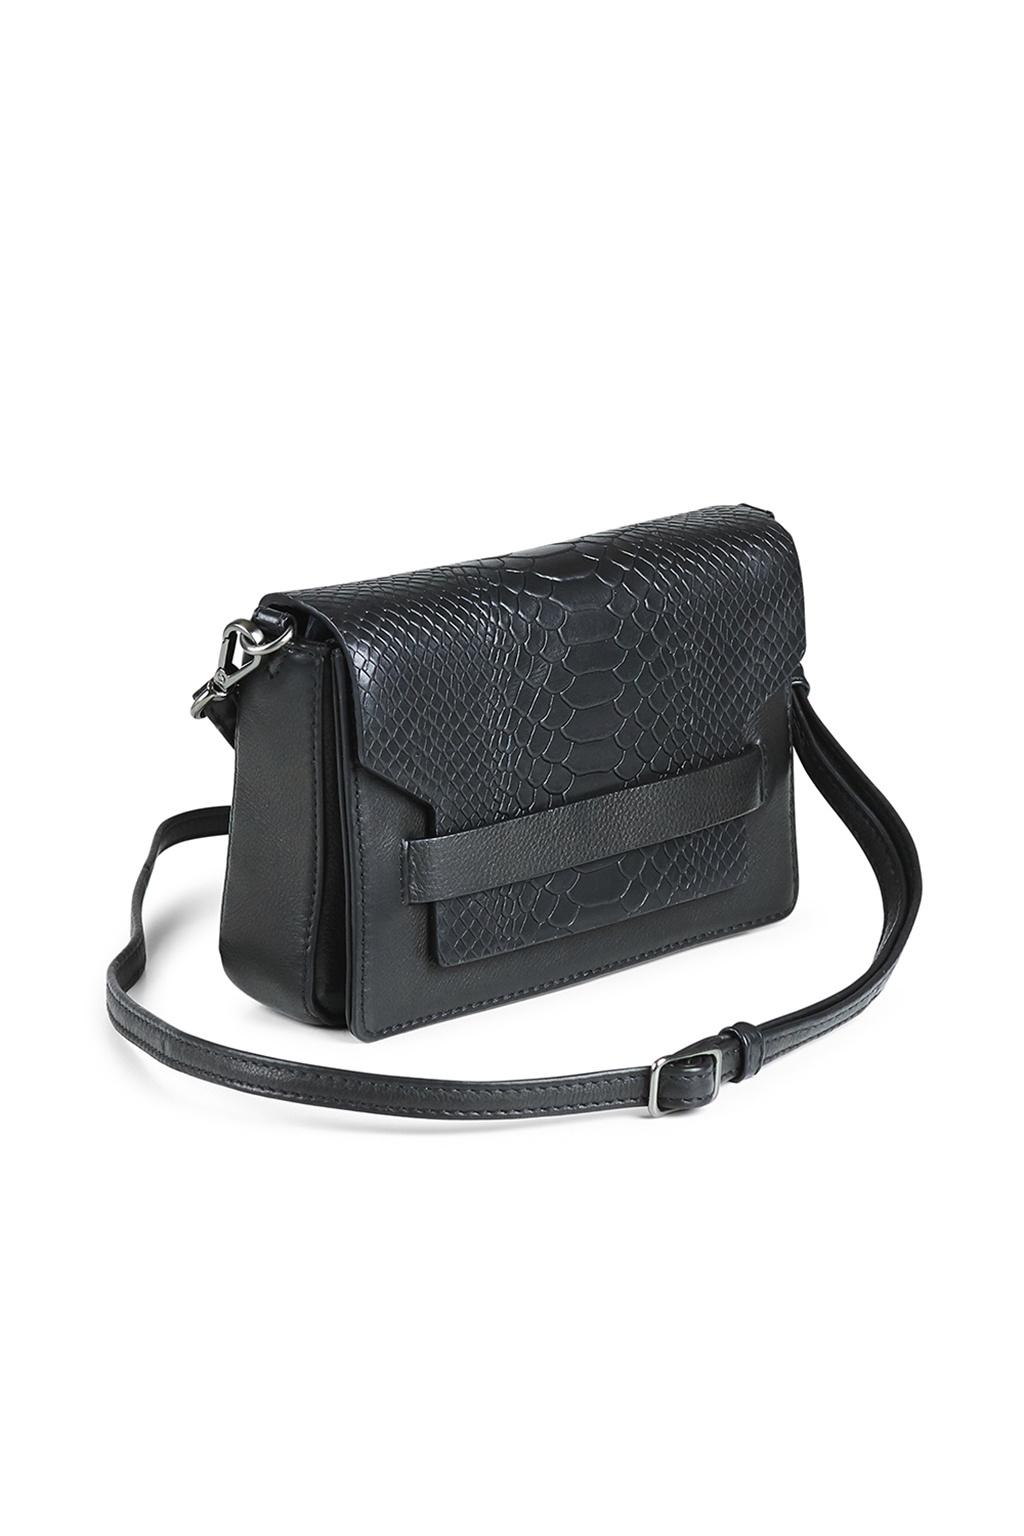 Vanya Crossbody Bag Snake - Black-2